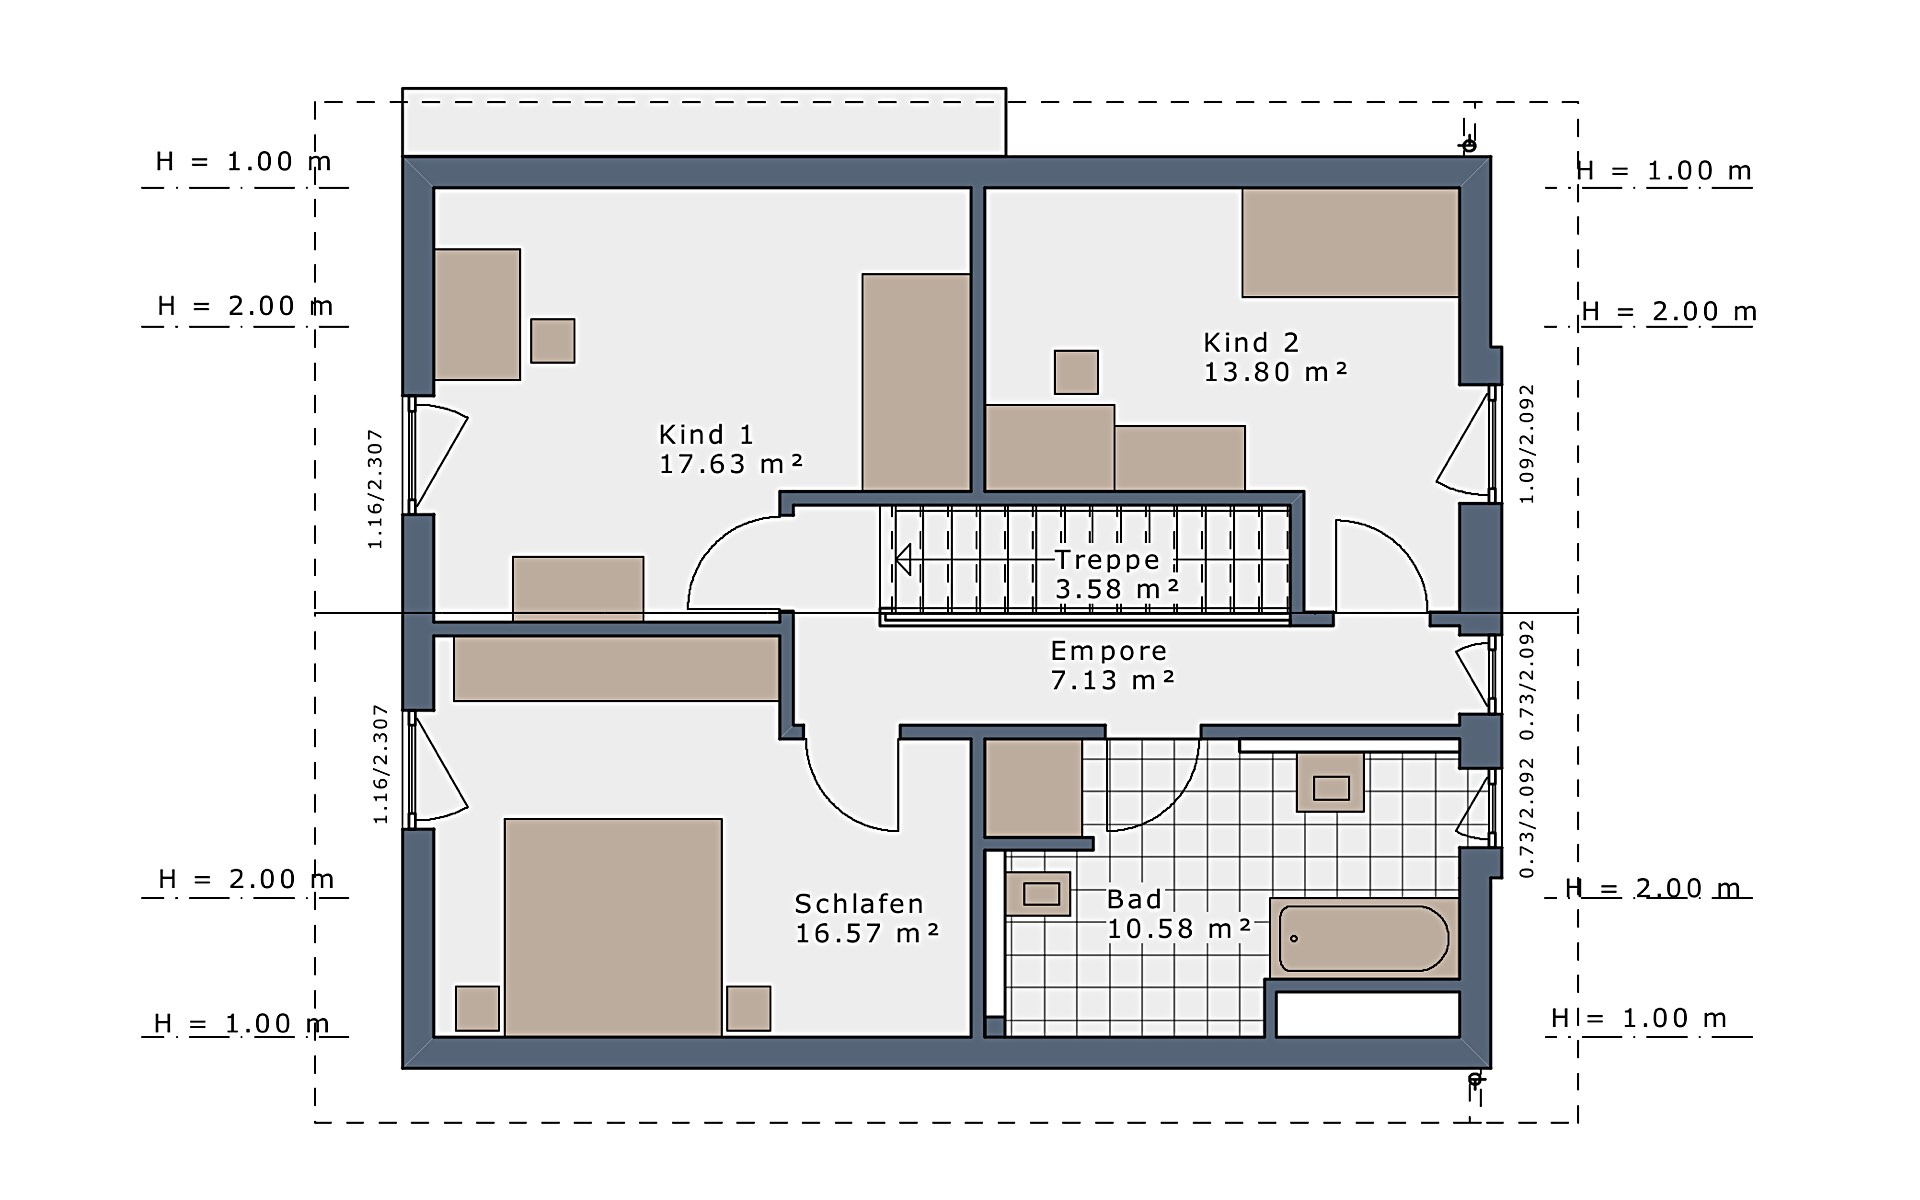 Dachgeschoss SmartSpace-E-140 E1 von Schwabenhaus GmbH & Co. KG